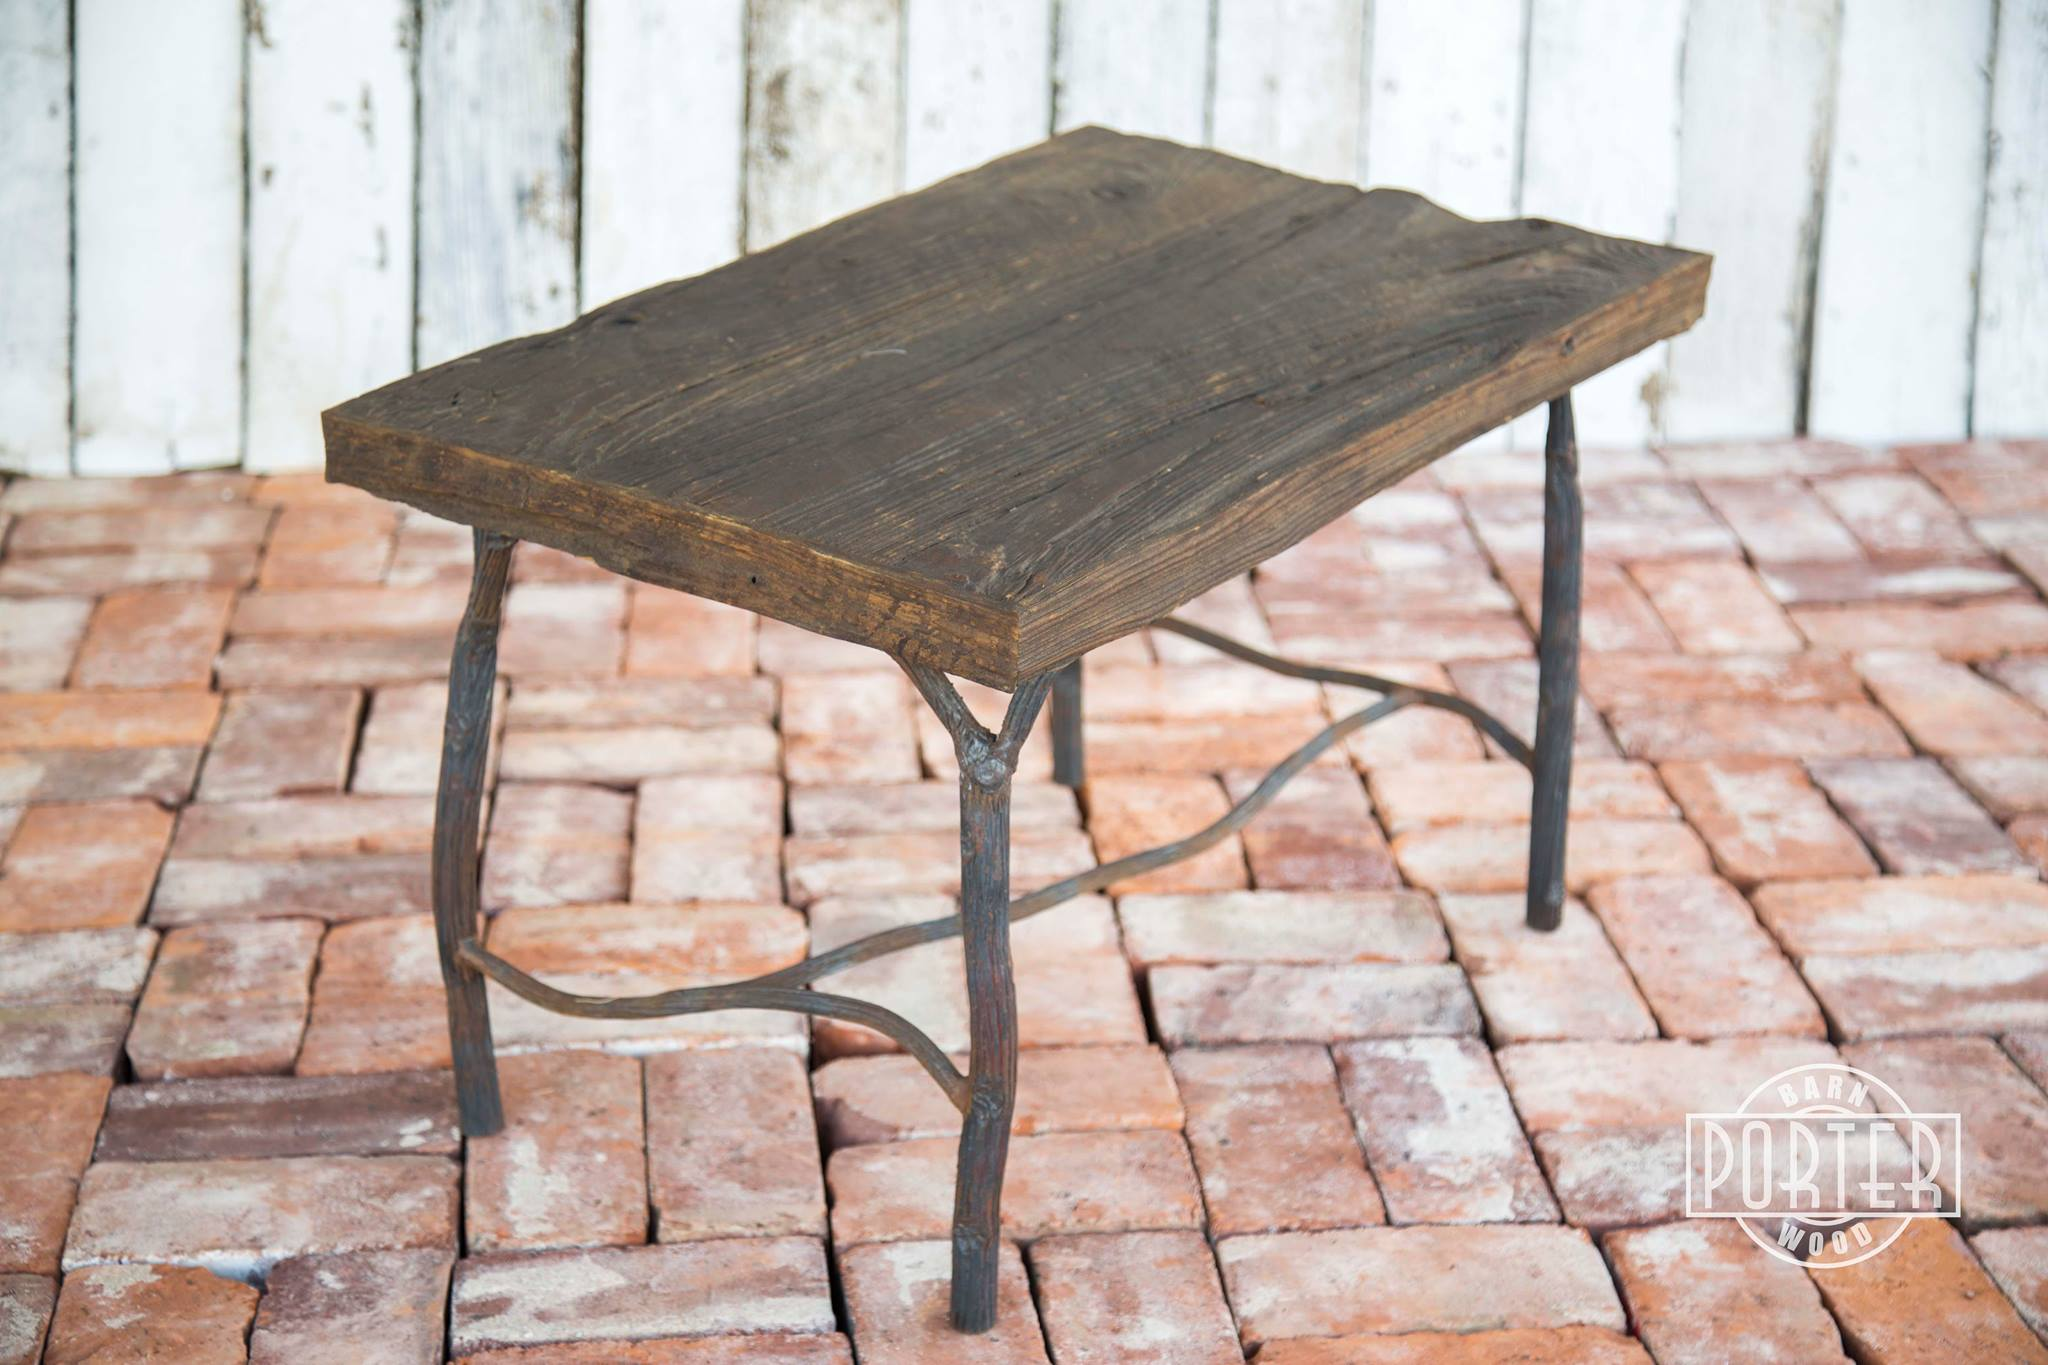 Enjoyable Mushroom Wood End Table With Organic Steel Base Porter Download Free Architecture Designs Crovemadebymaigaardcom